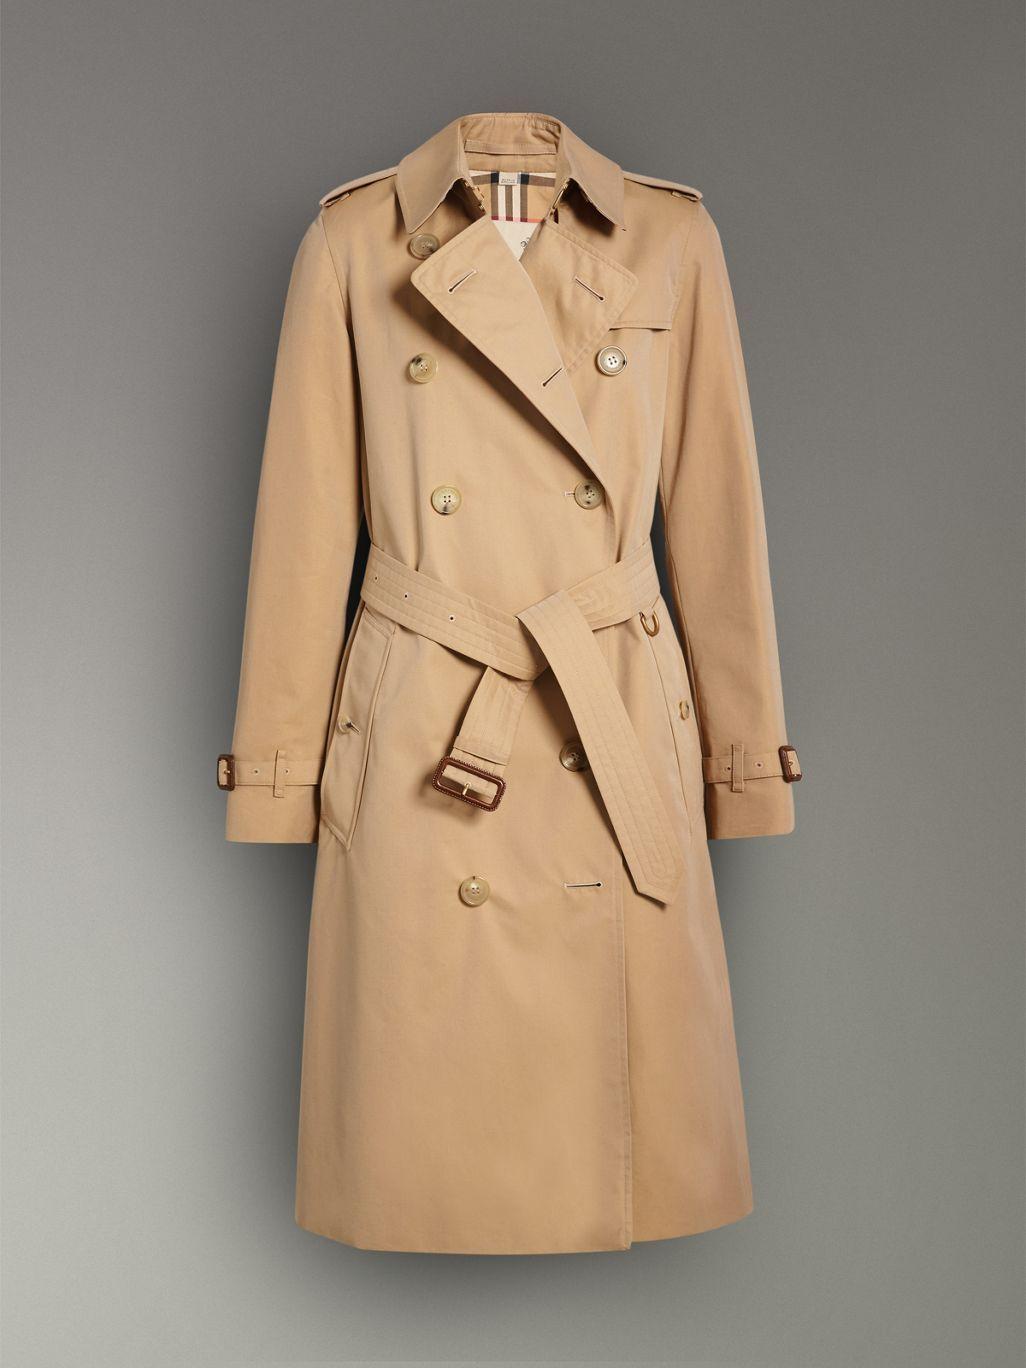 32b8c5a47 The Long Kensington Heritage Trench Coat in Mid Grey - Women ...